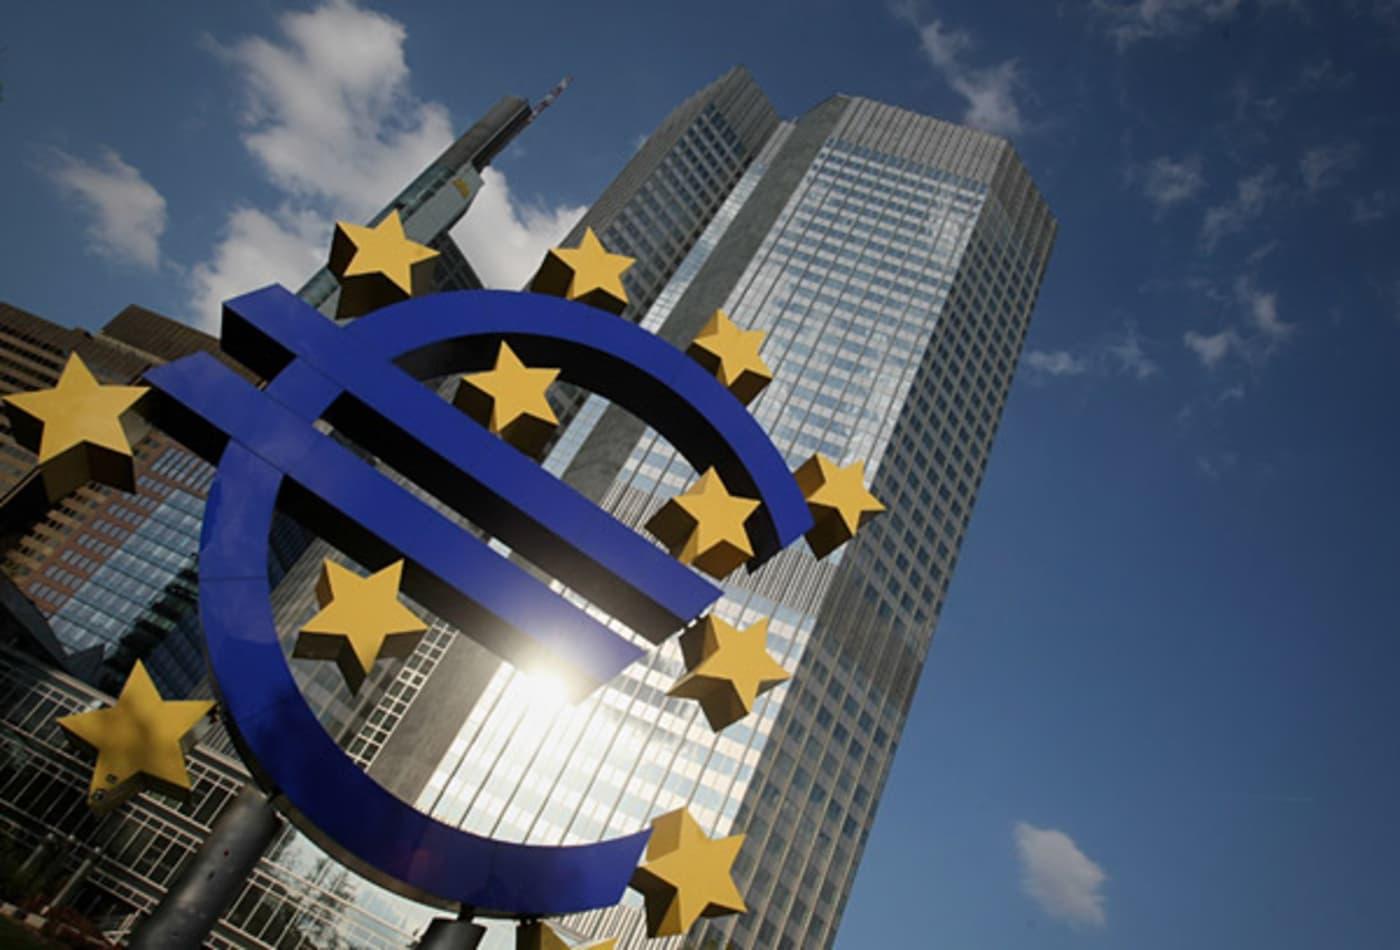 CNBC_Major_Events_Eurozone-ecb.jpg